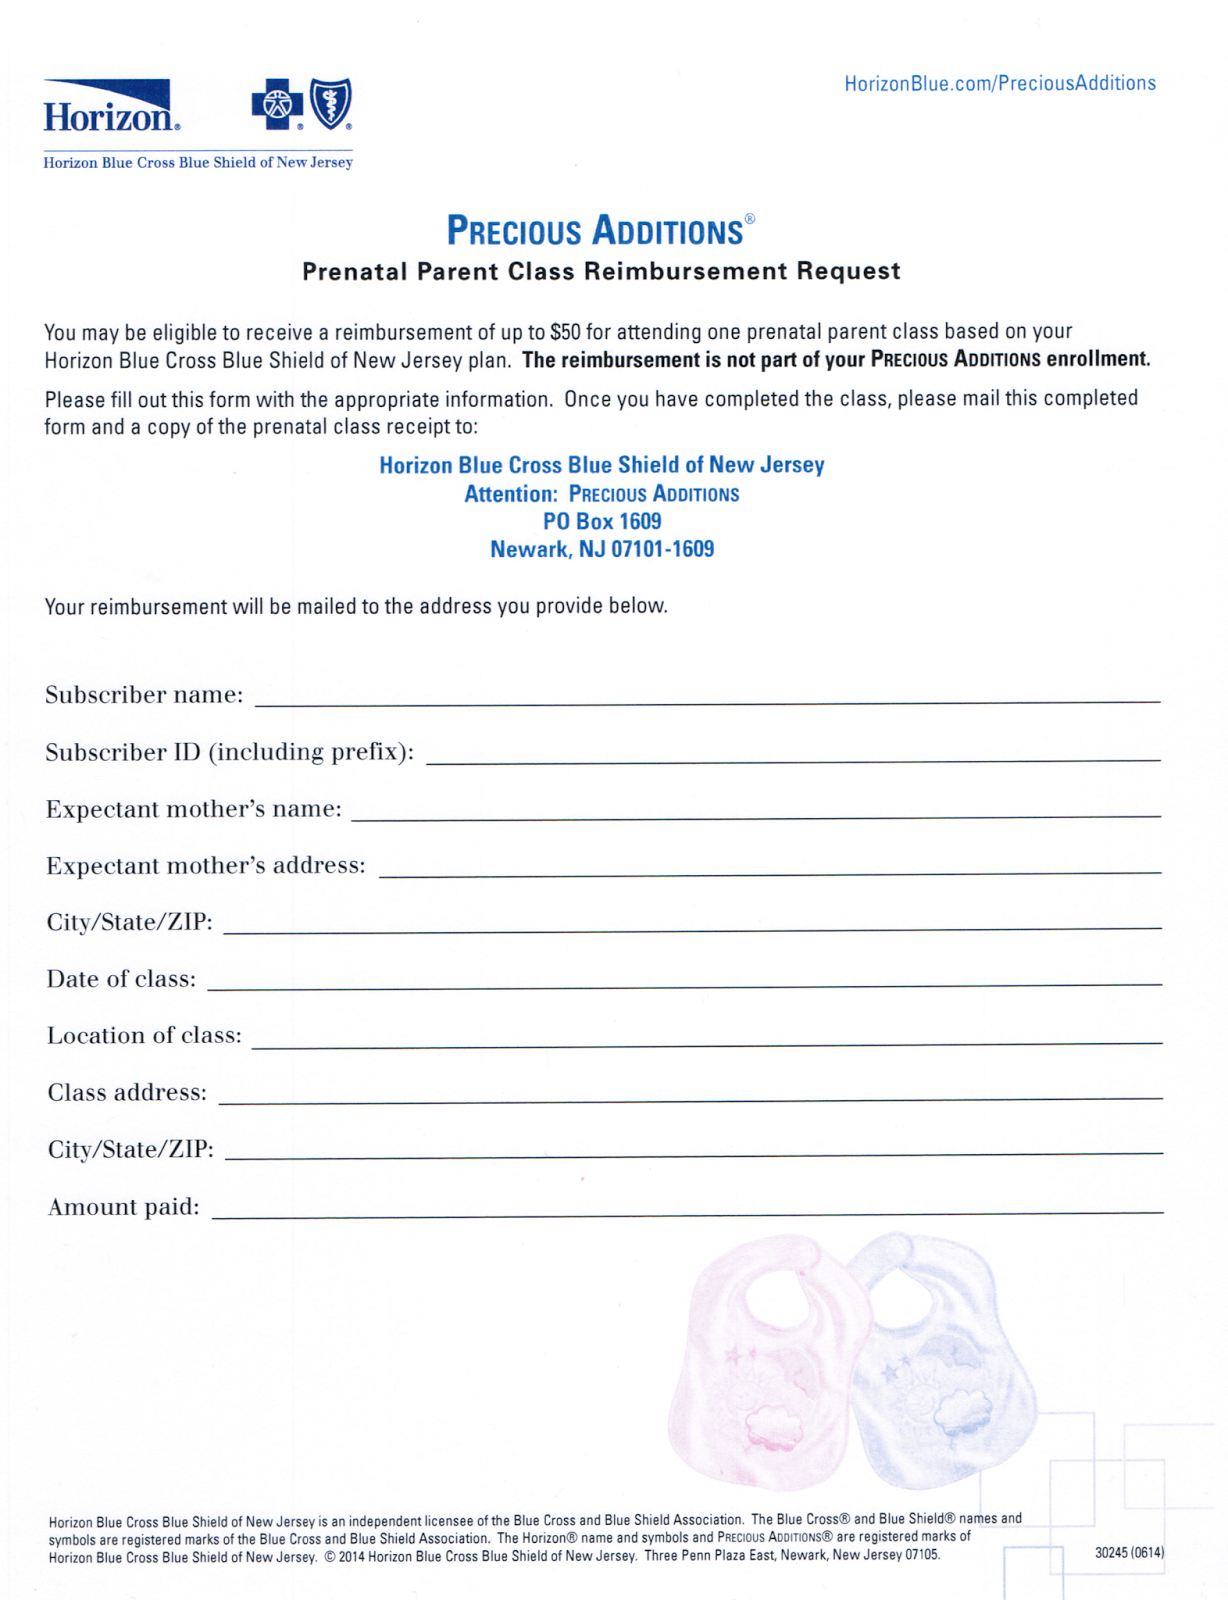 Horizon BlueCross BlueShield BCBS Precious Addition Prenatal